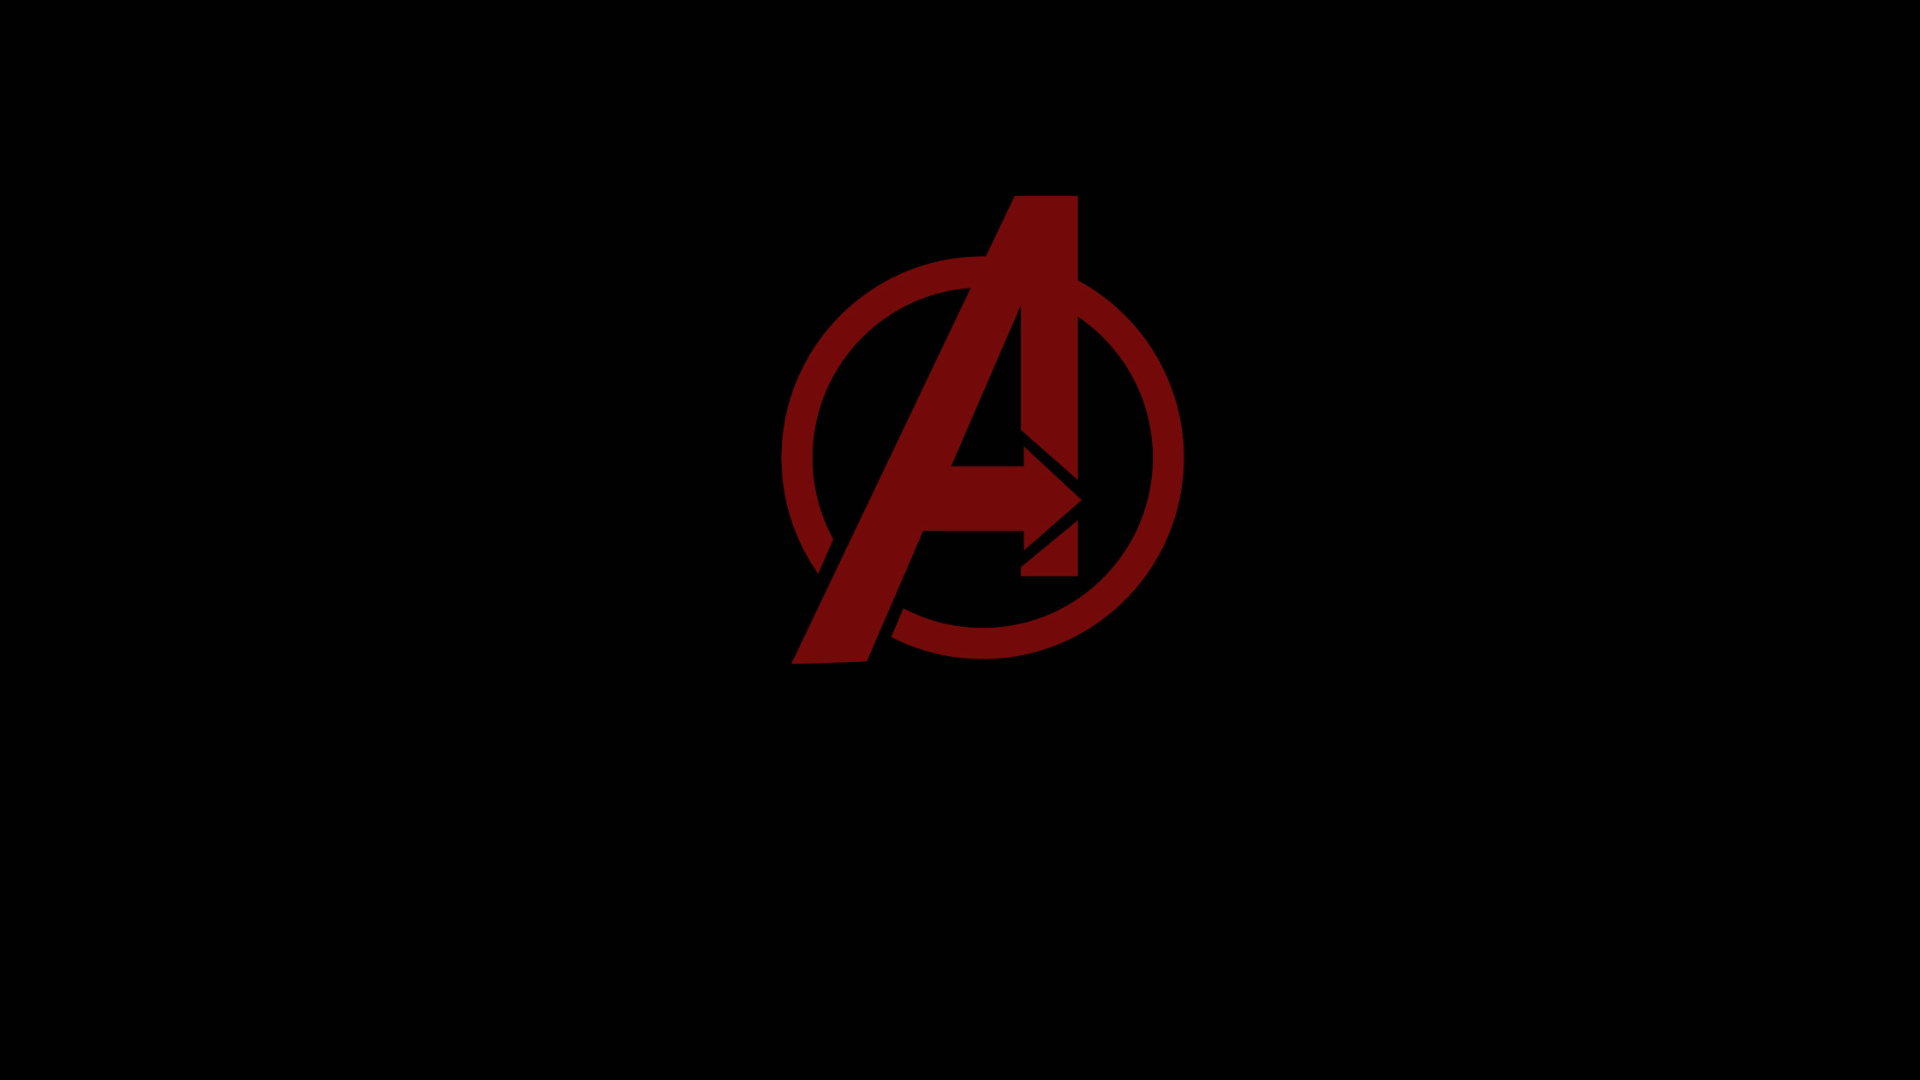 avengers-minimal-logo-qp.jpg